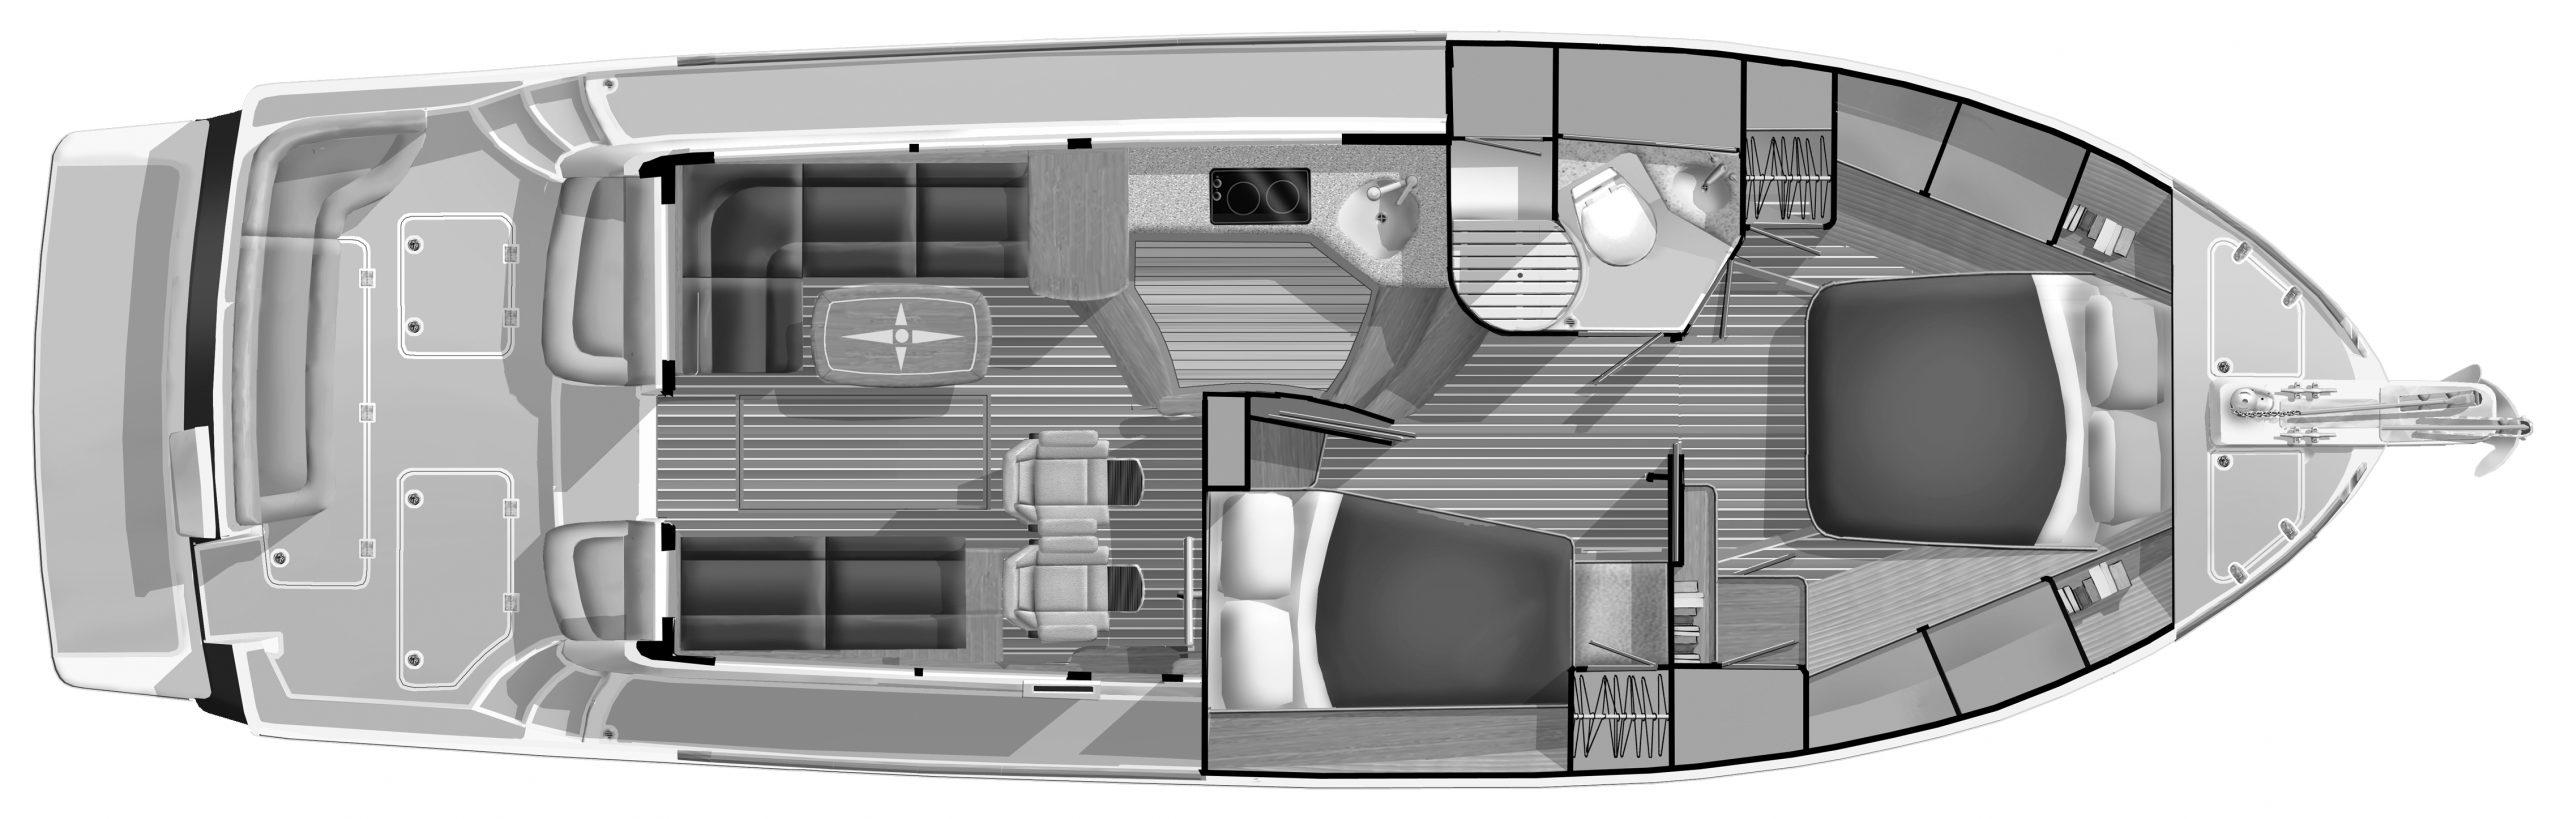 42 Flybridge Floor Plan 1